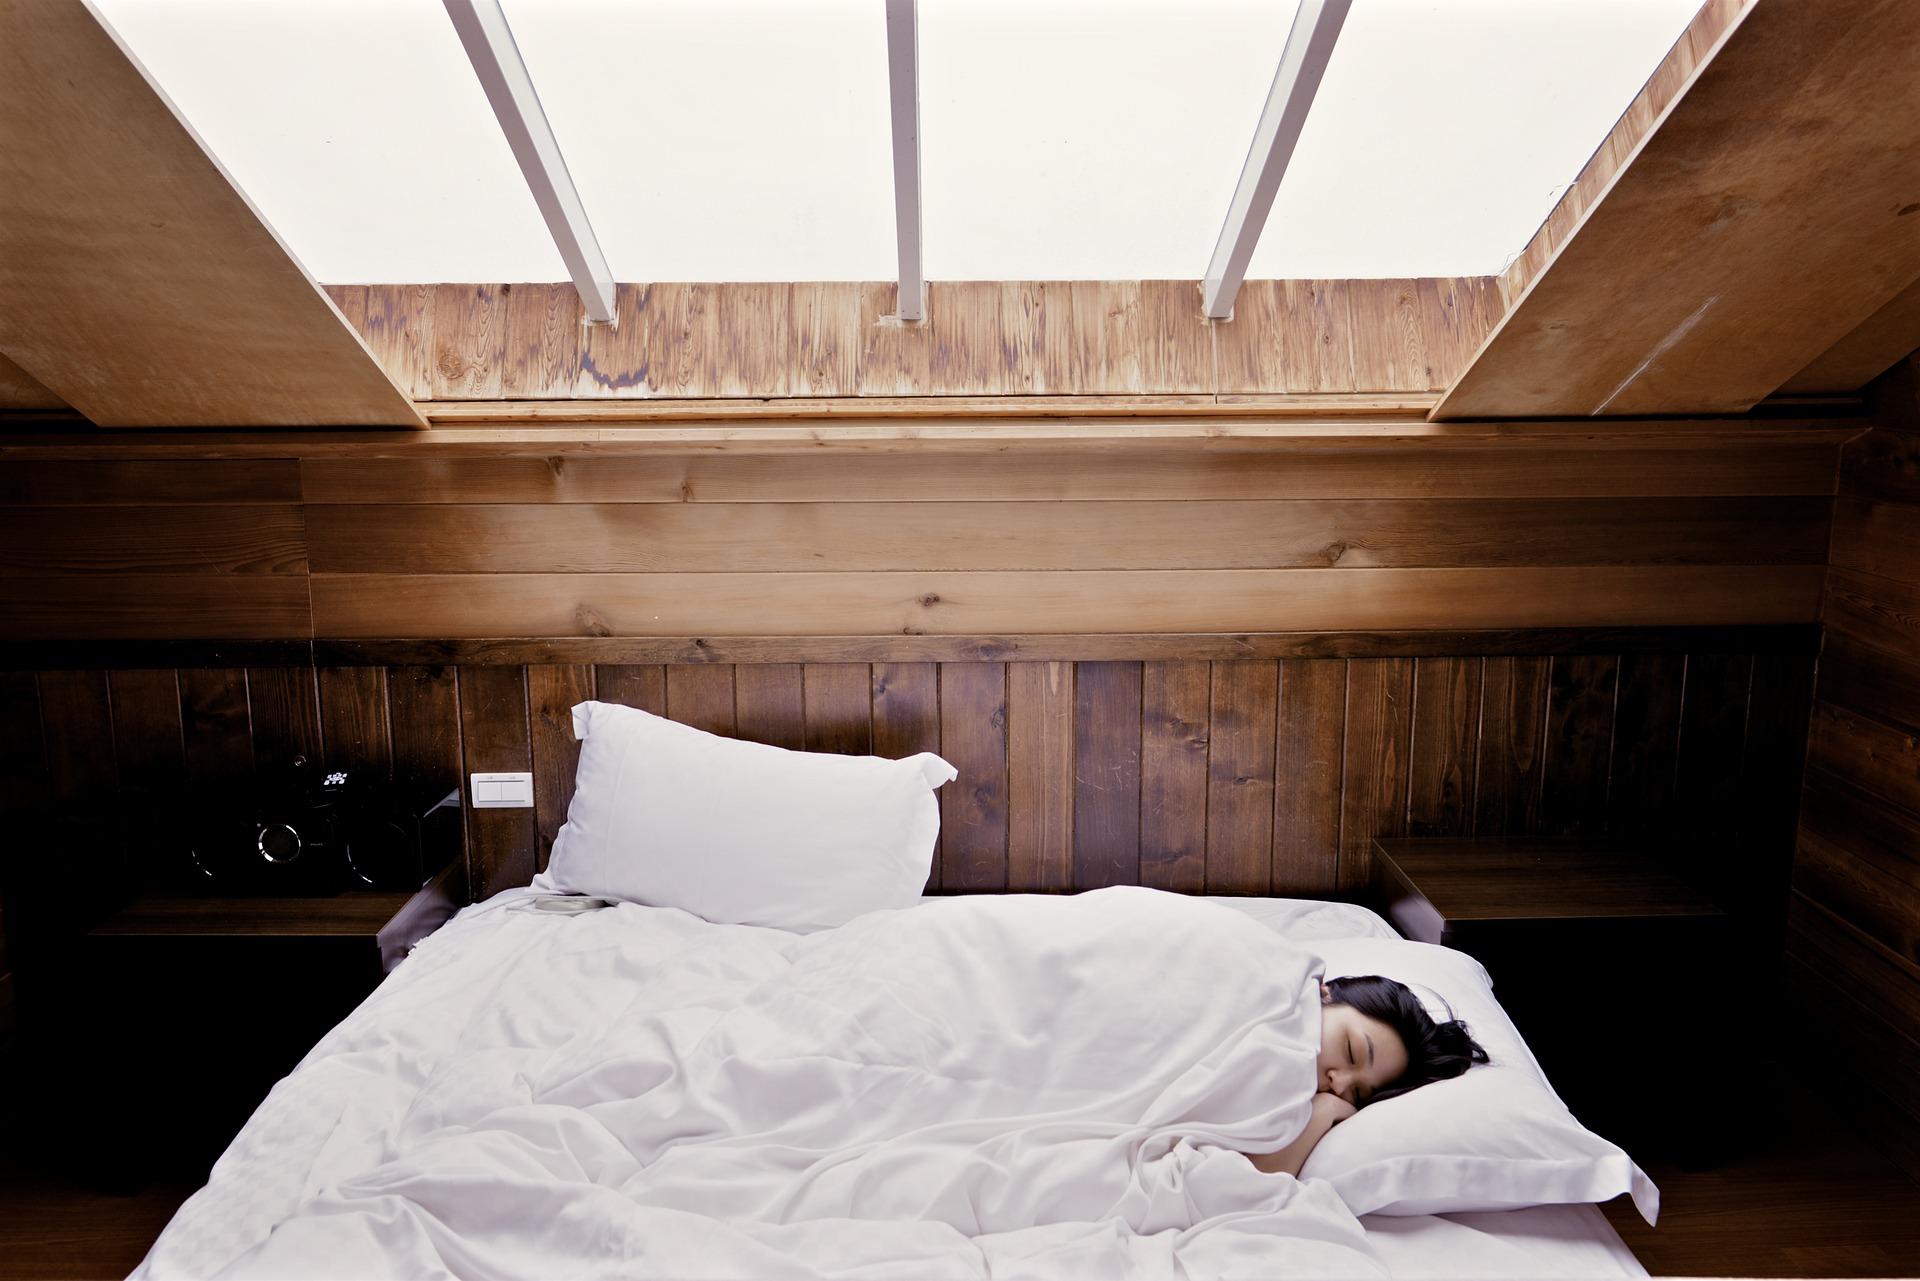 sleep-1209288_1920